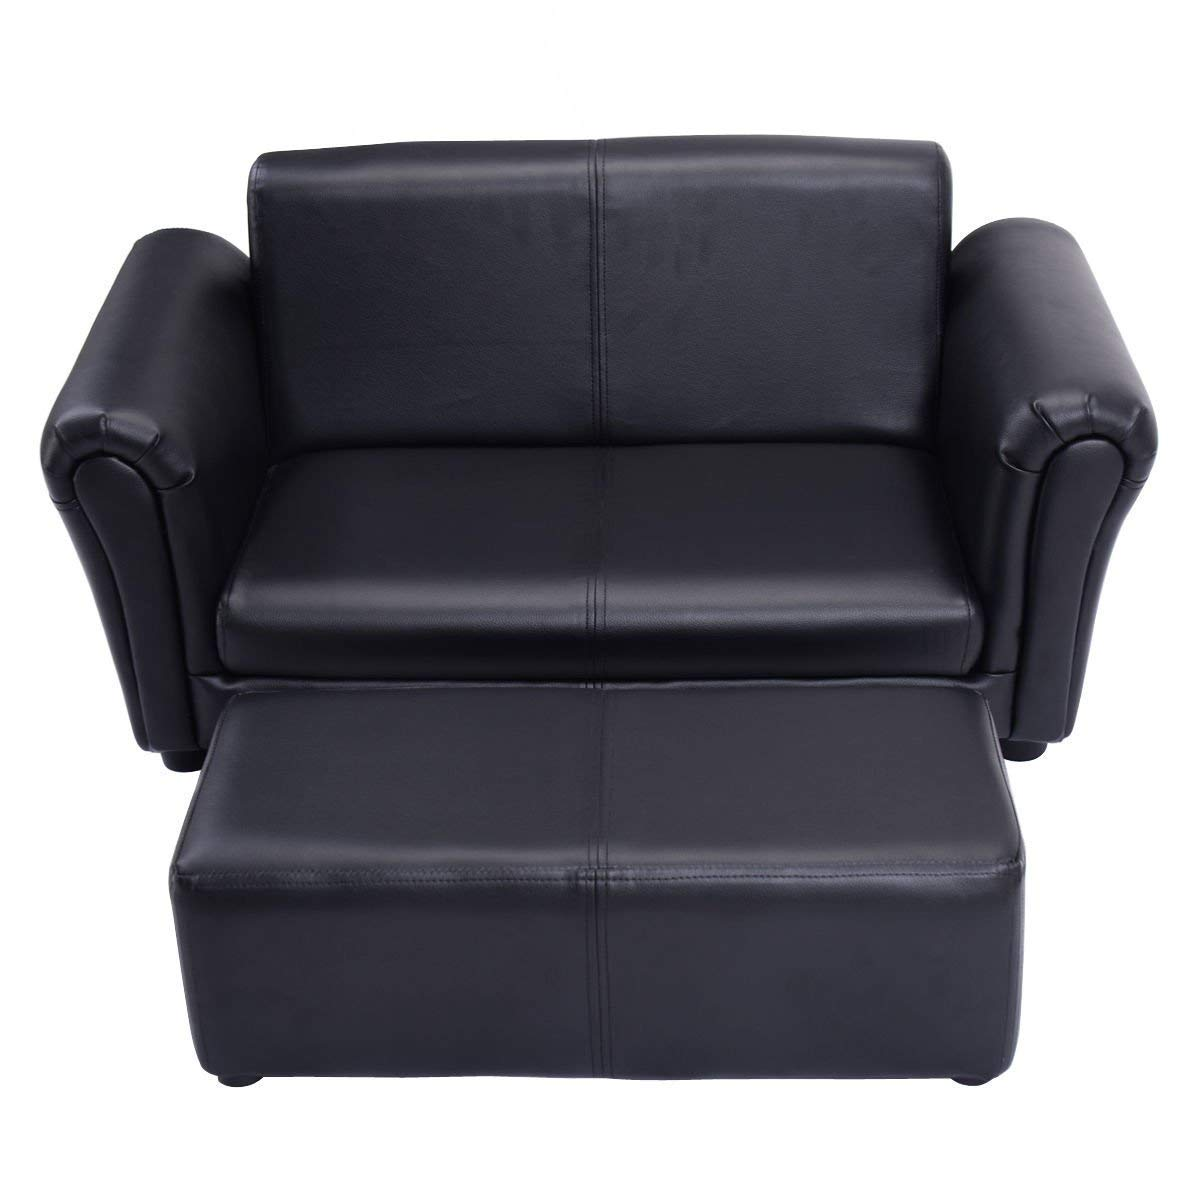 HONEY JOY Kids Sofa Set 2 Seater Armrest Children Couch Lounge w/Footstool (Black) by HONEY JOY